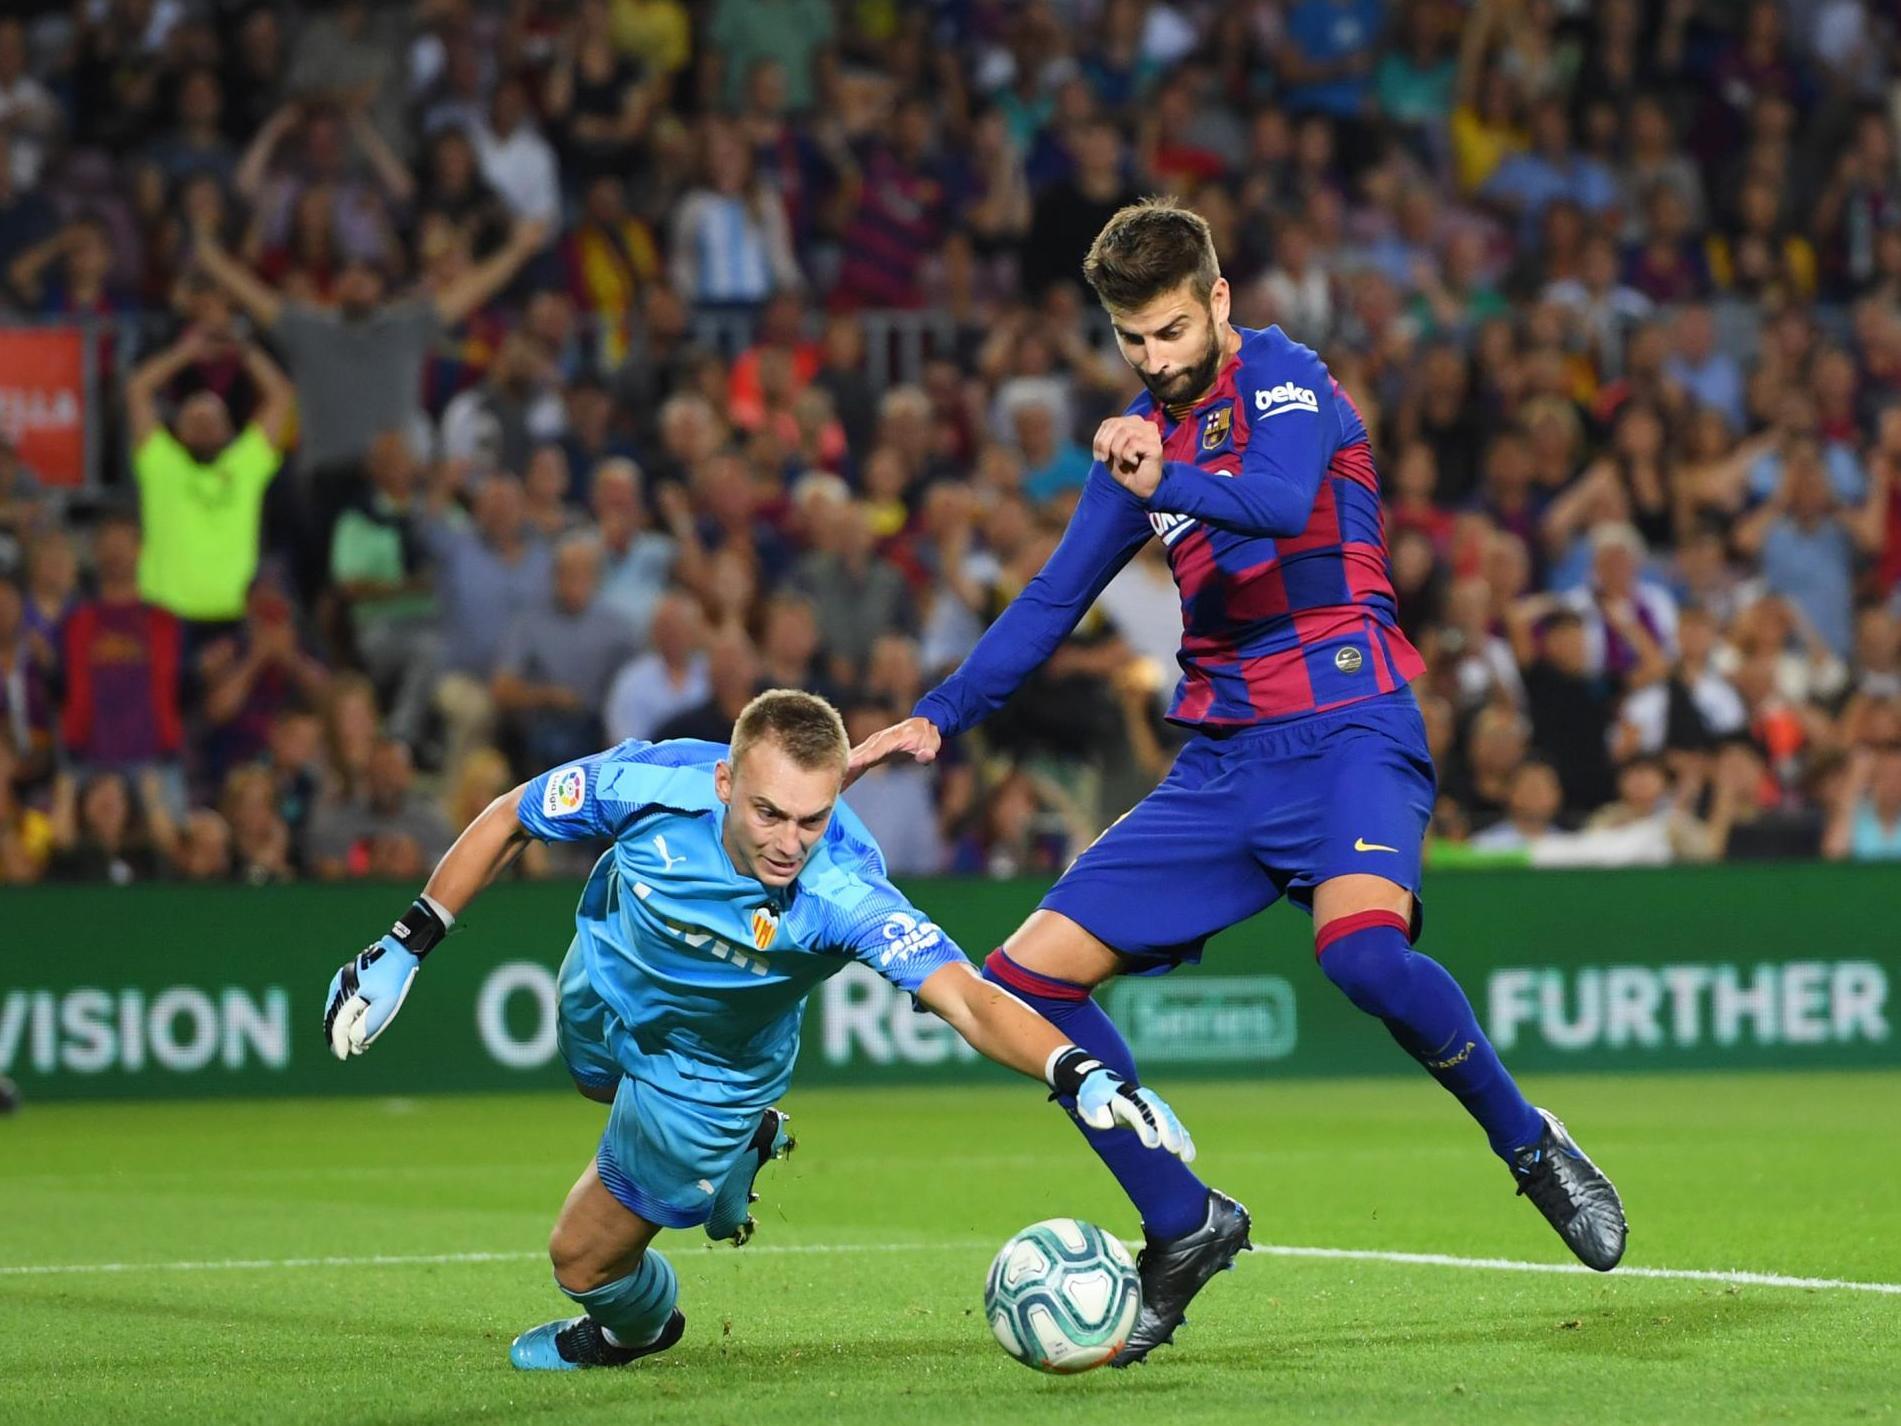 valencia vs barcelona - photo #16